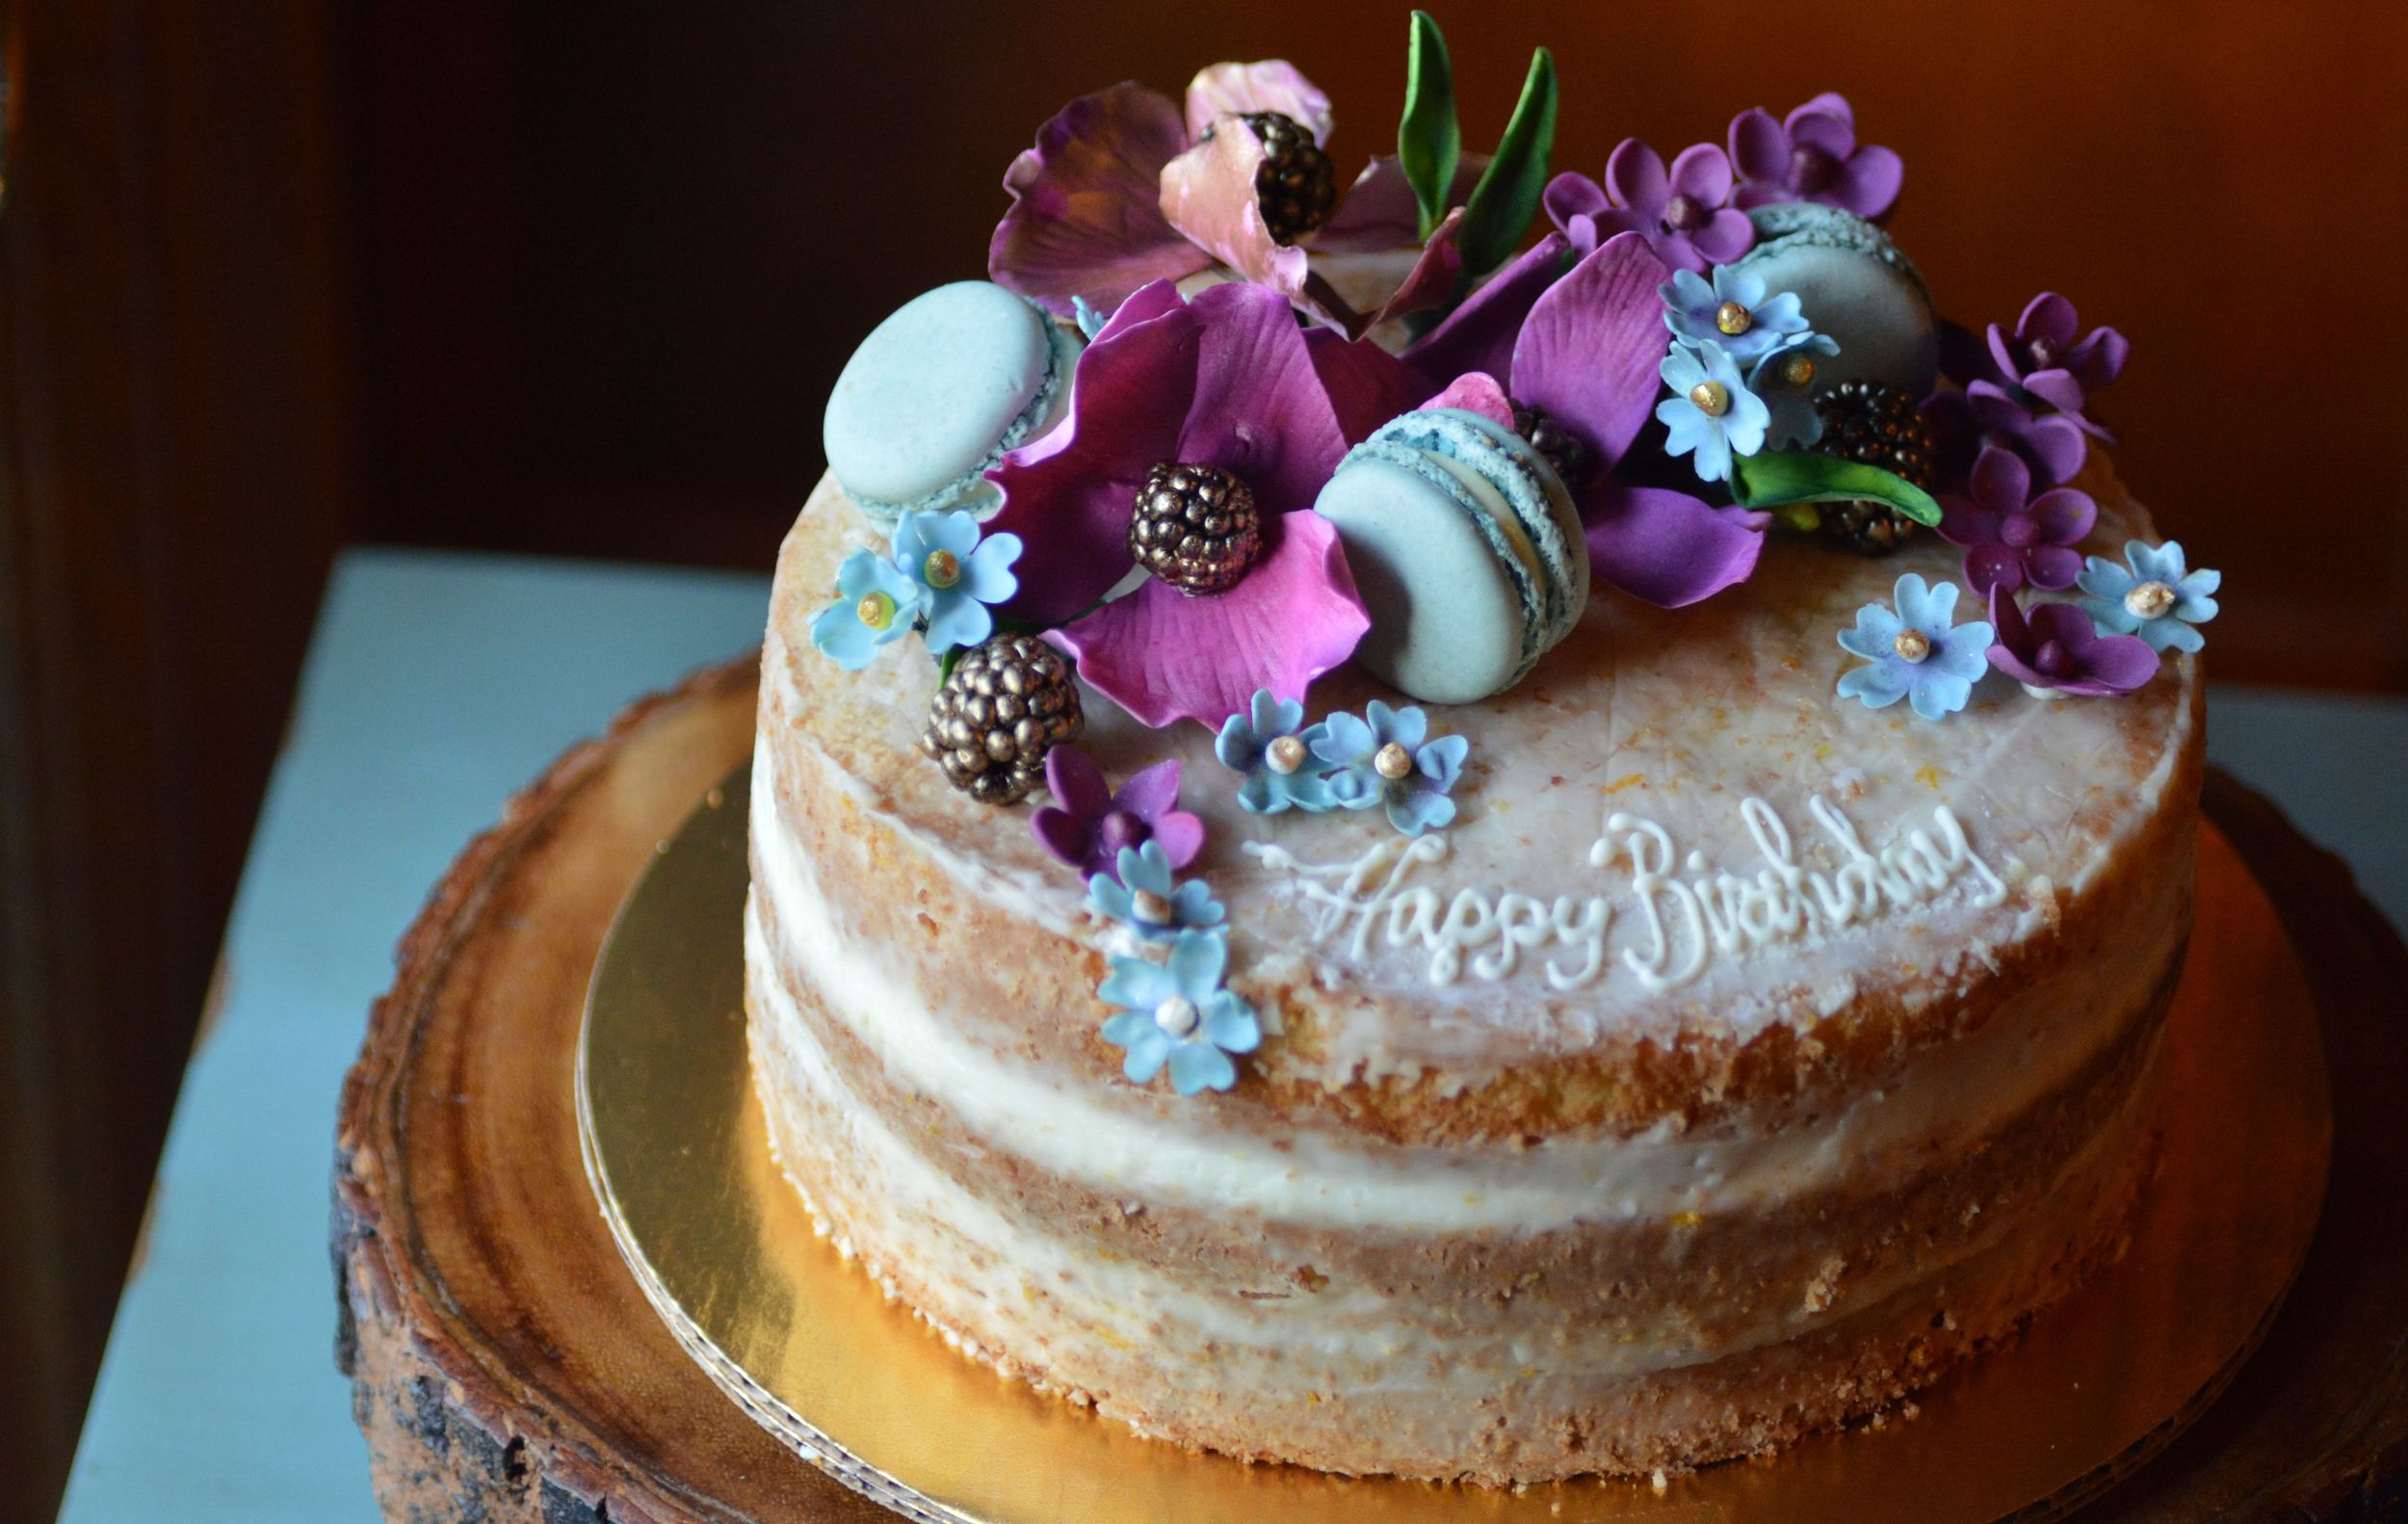 Custom dairy free cake with handmade edible flowers